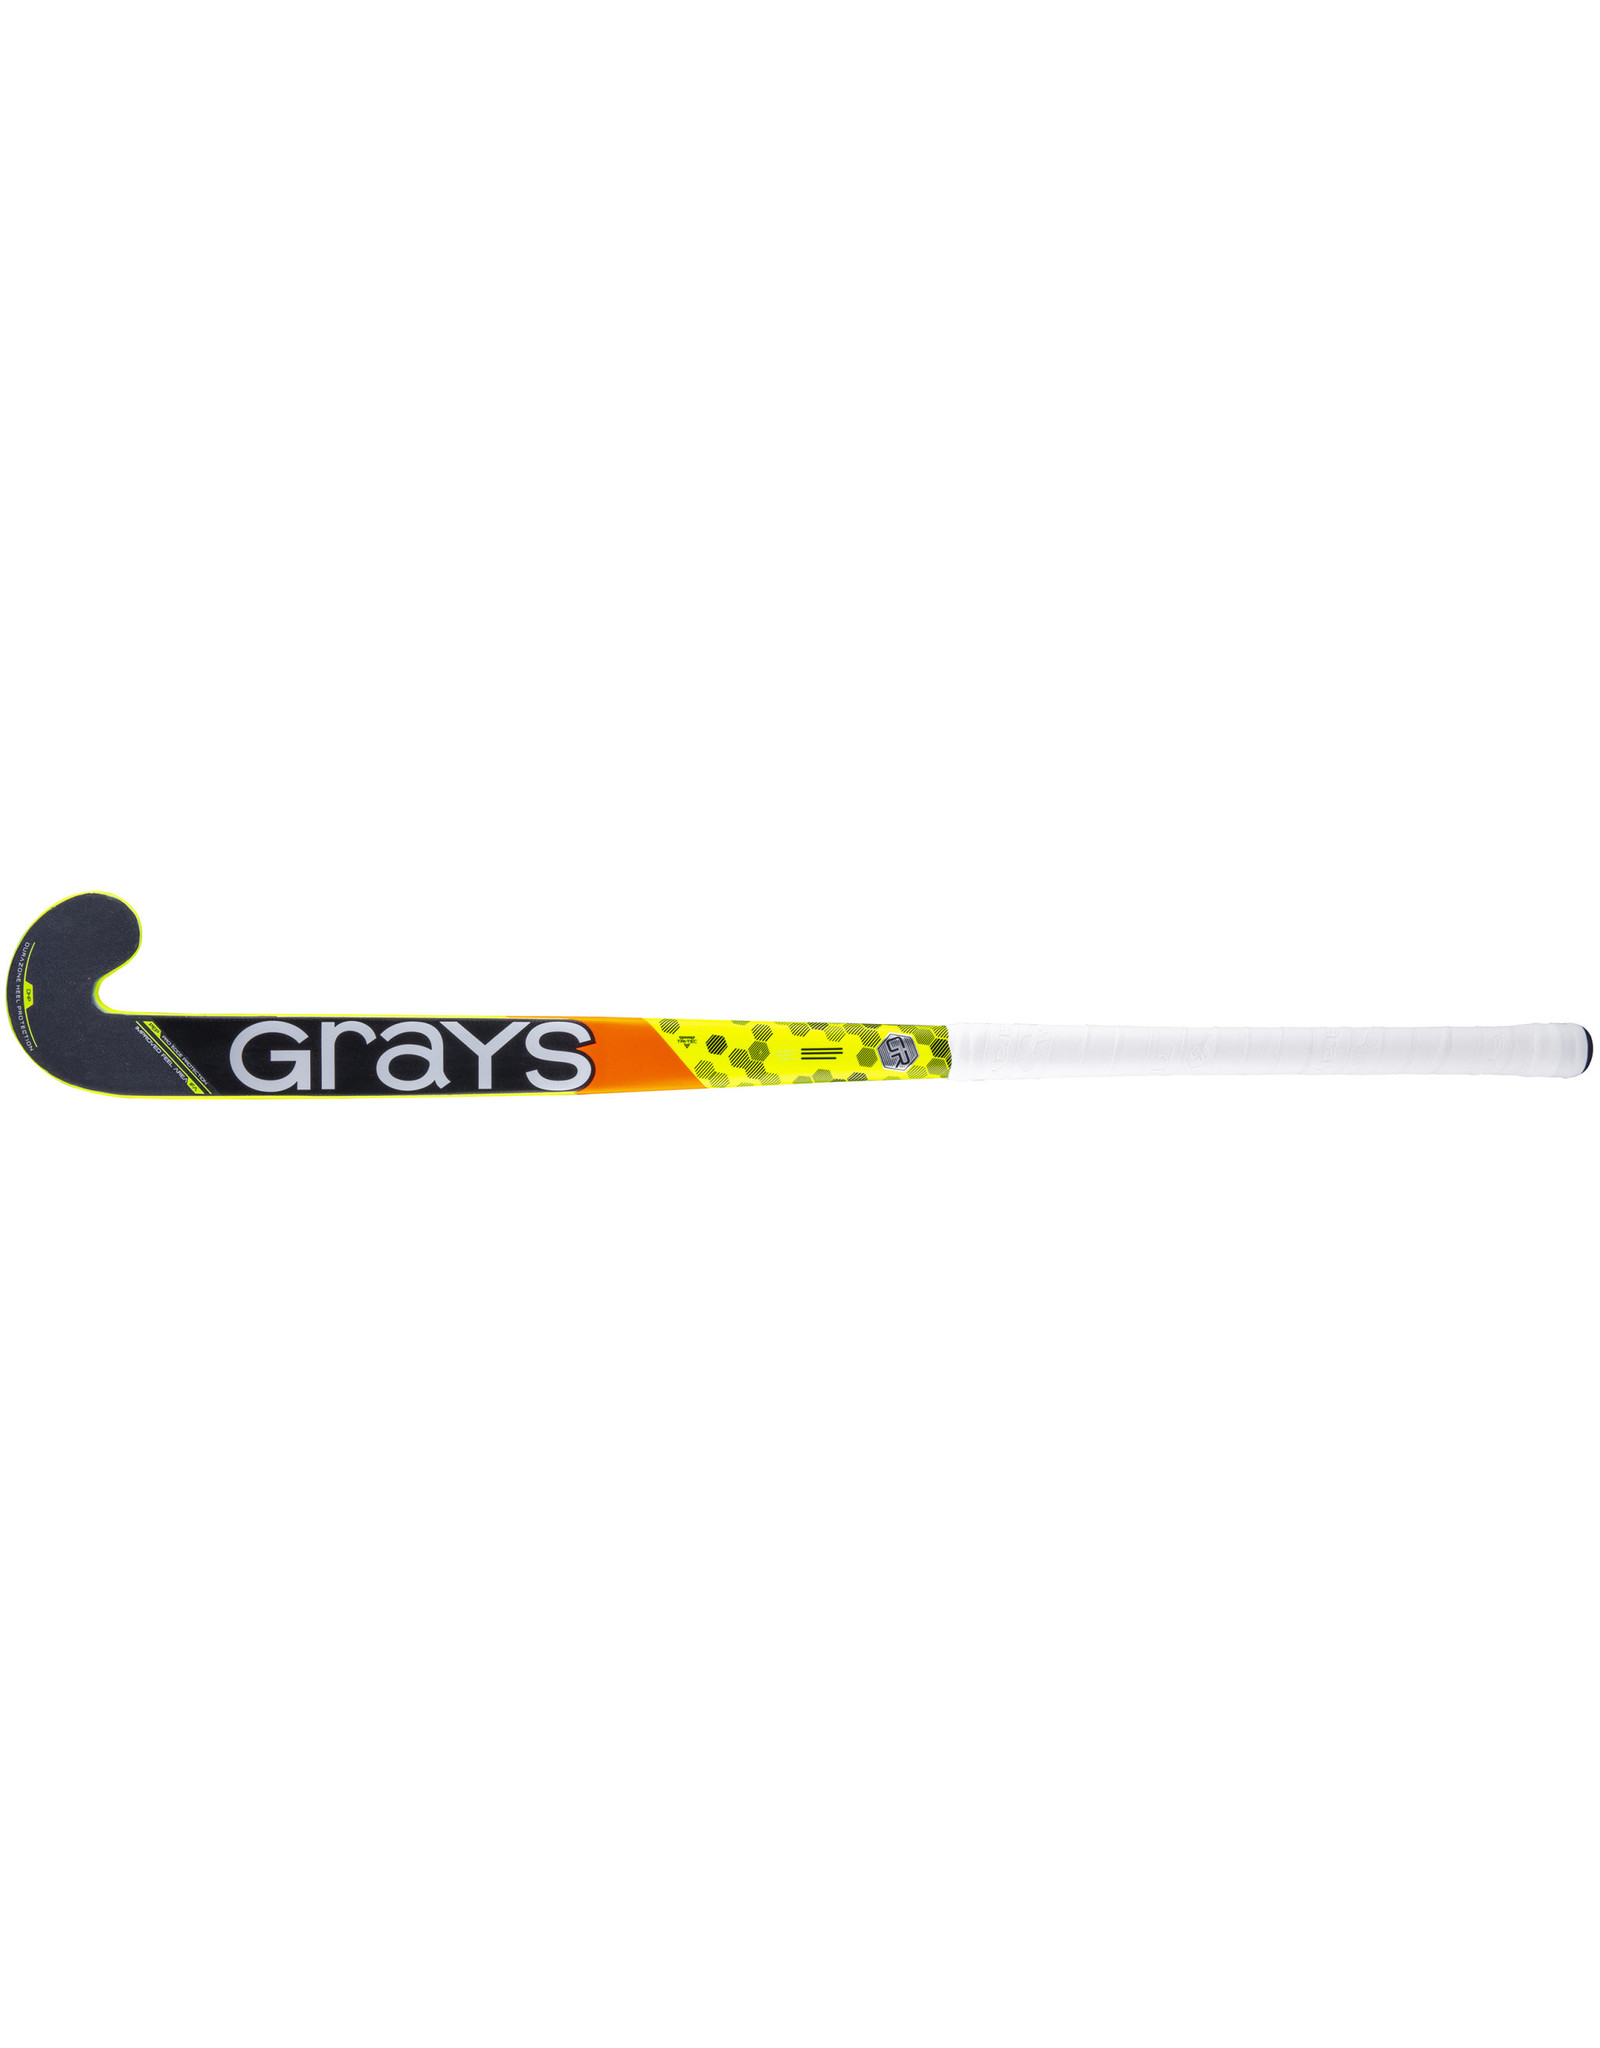 Grays STK GR9000 UB MC